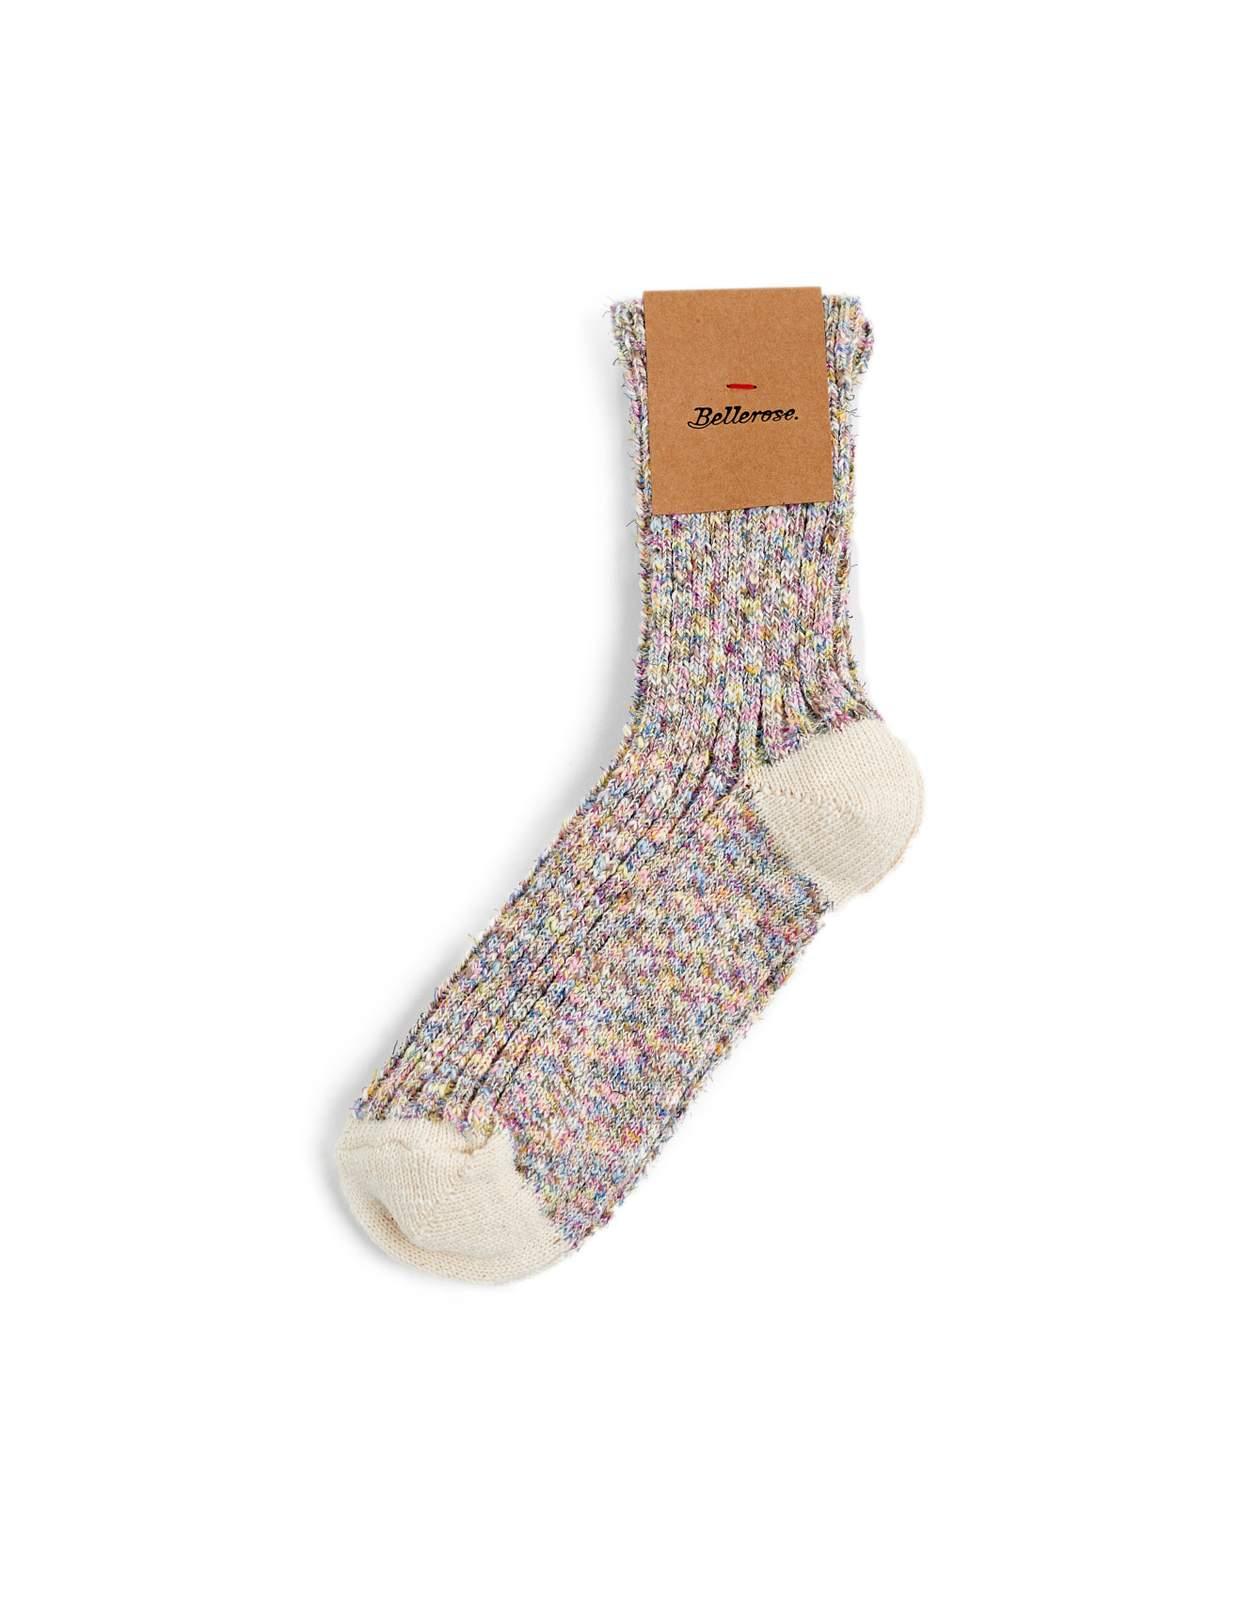 socks_fawada_k0915C_combo1_1_1_1600x1600.jpg